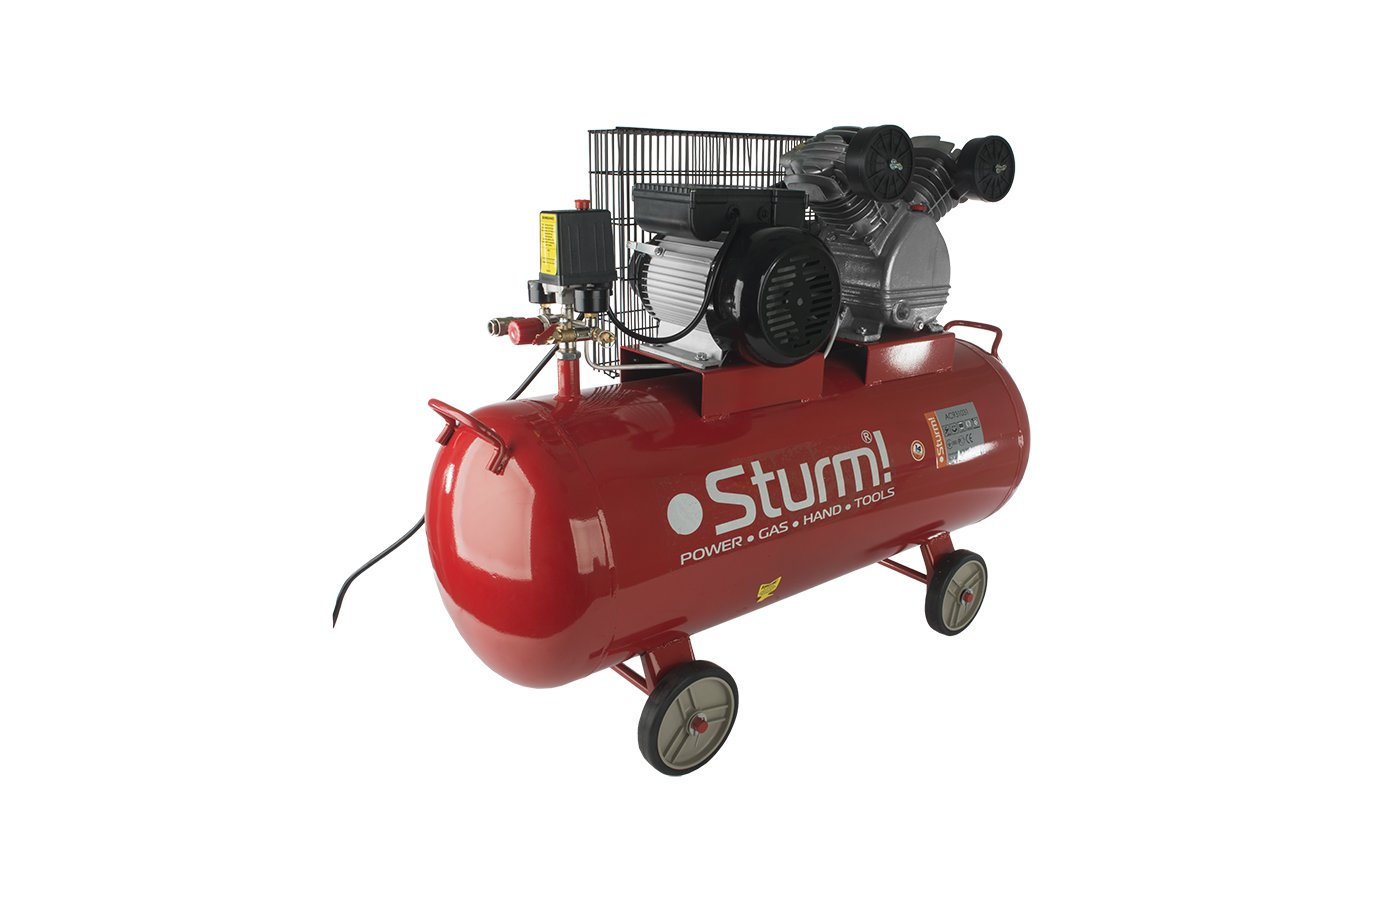 STURM AC931031